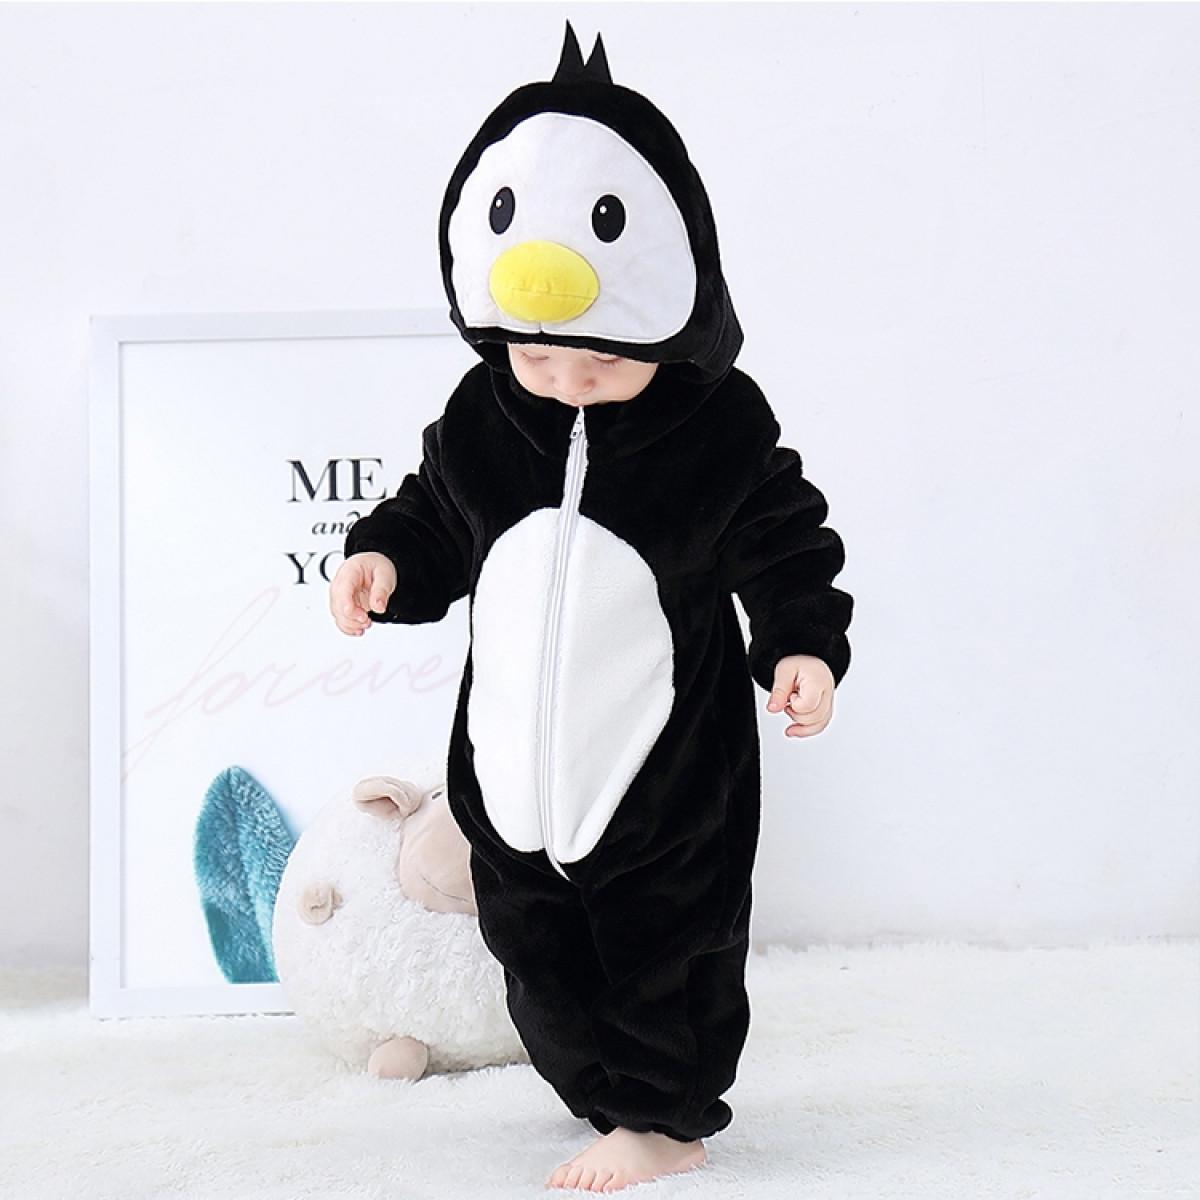 kostum za maškare za pingvina